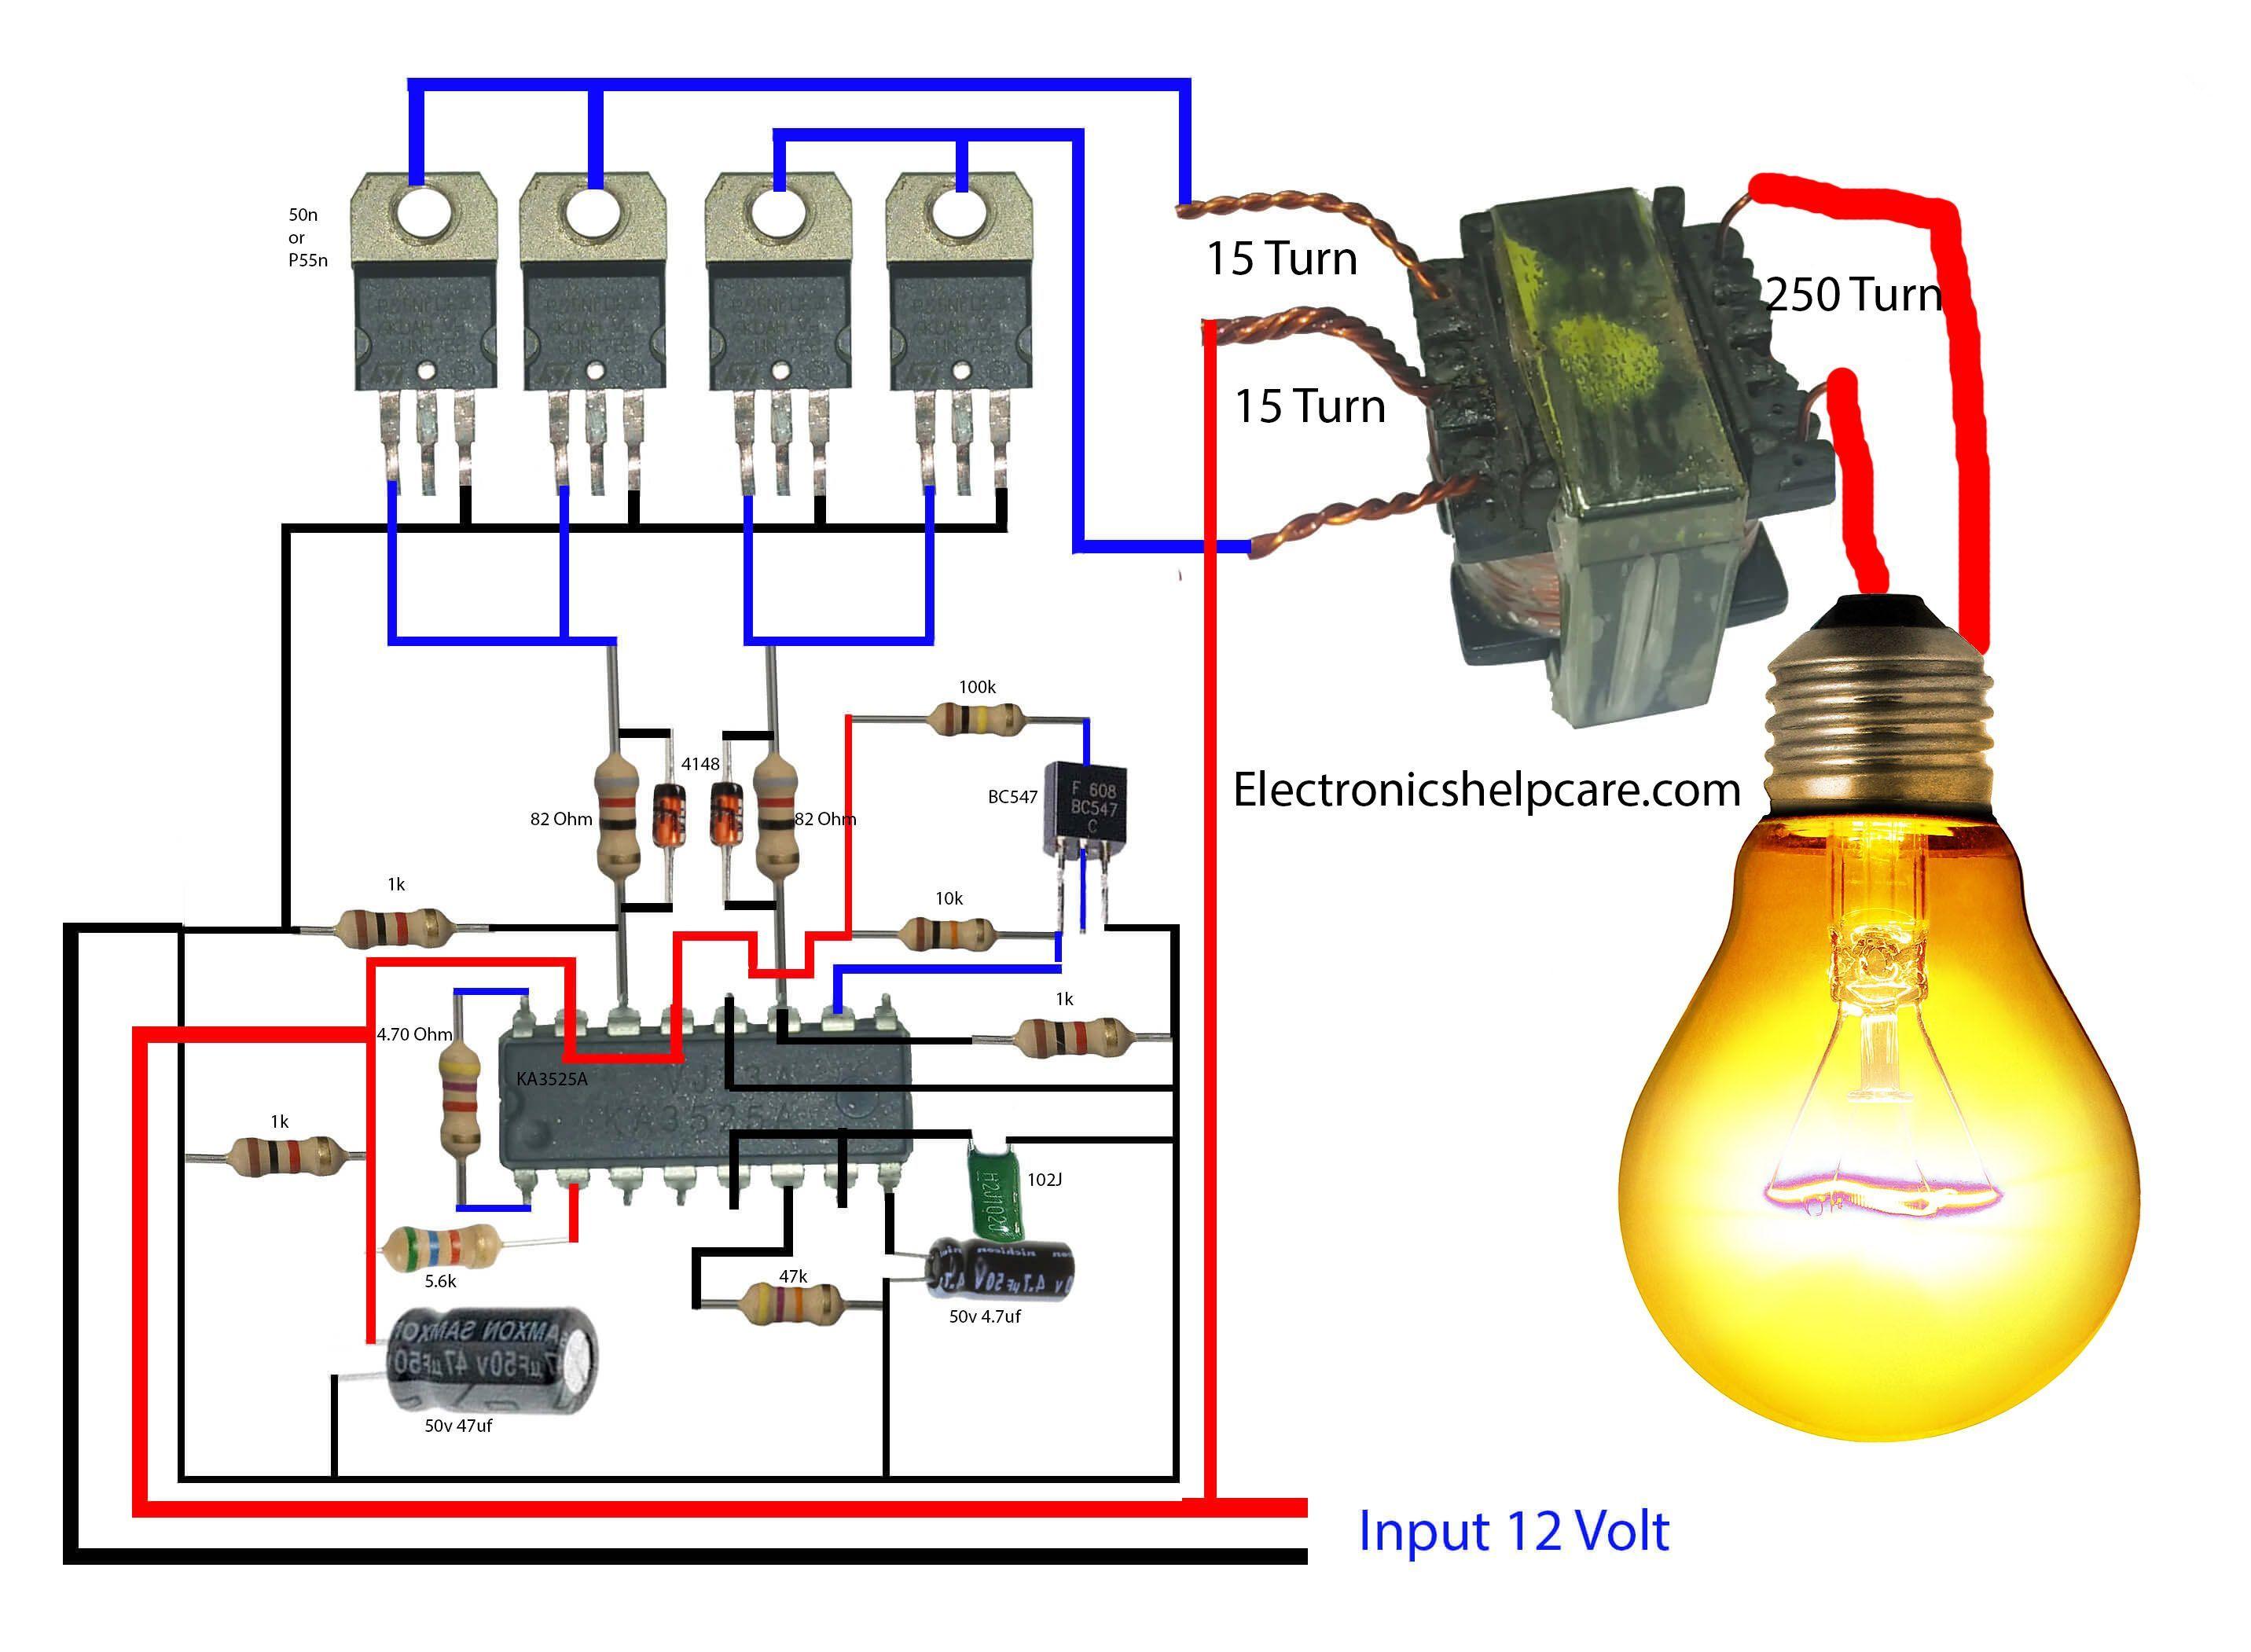 How To Make An Inverter Using 12v To 220v Electronics Logicboard Rangkaian Elektronik Elektronik Teknologi